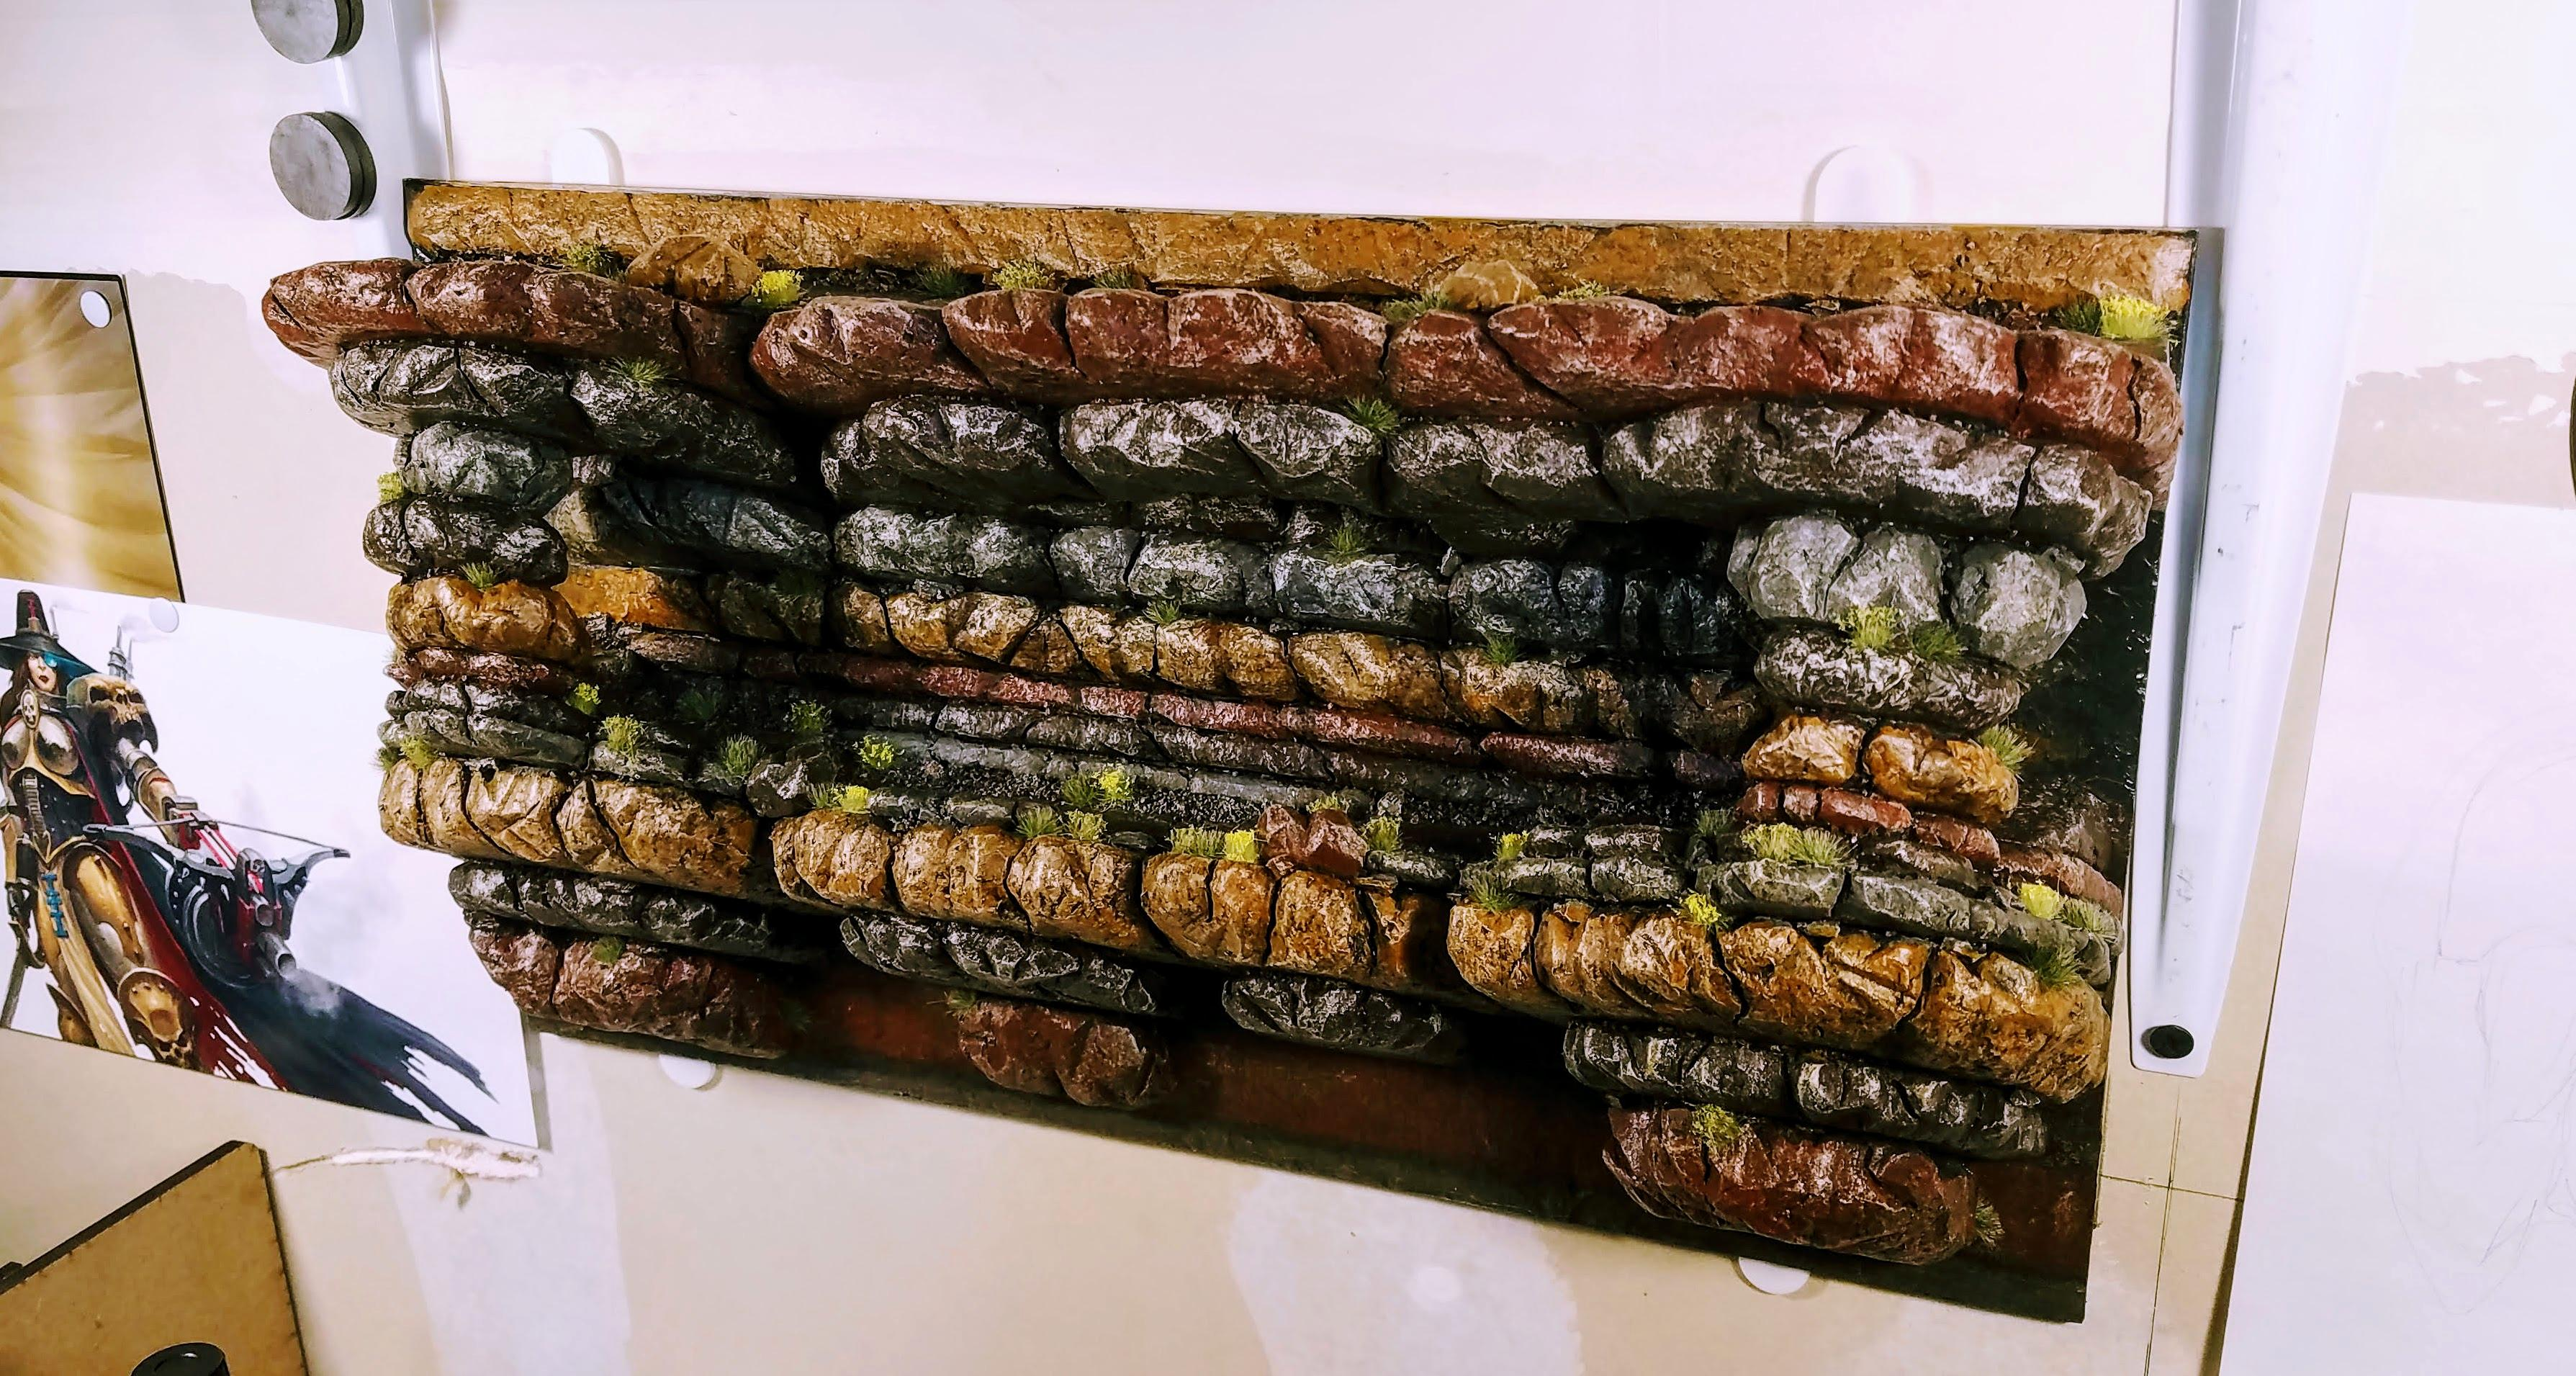 Shelf mounted on workshop wall